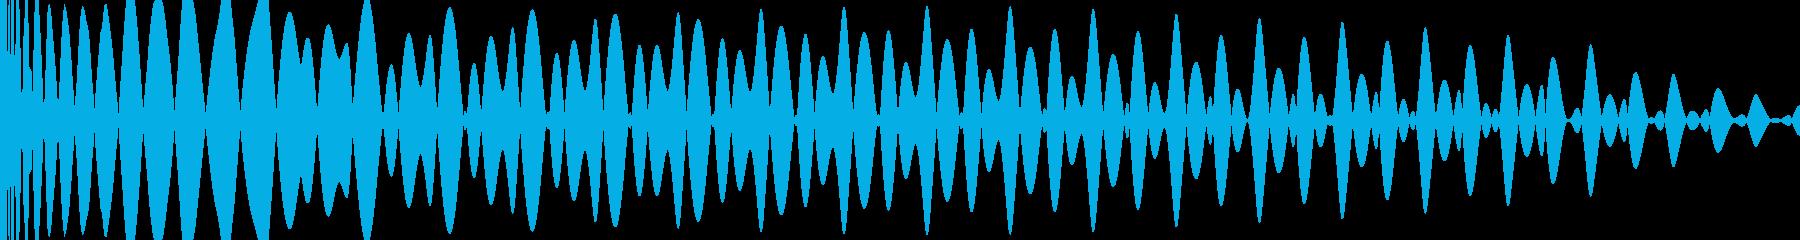 EDM キー(G)入りキックの再生済みの波形